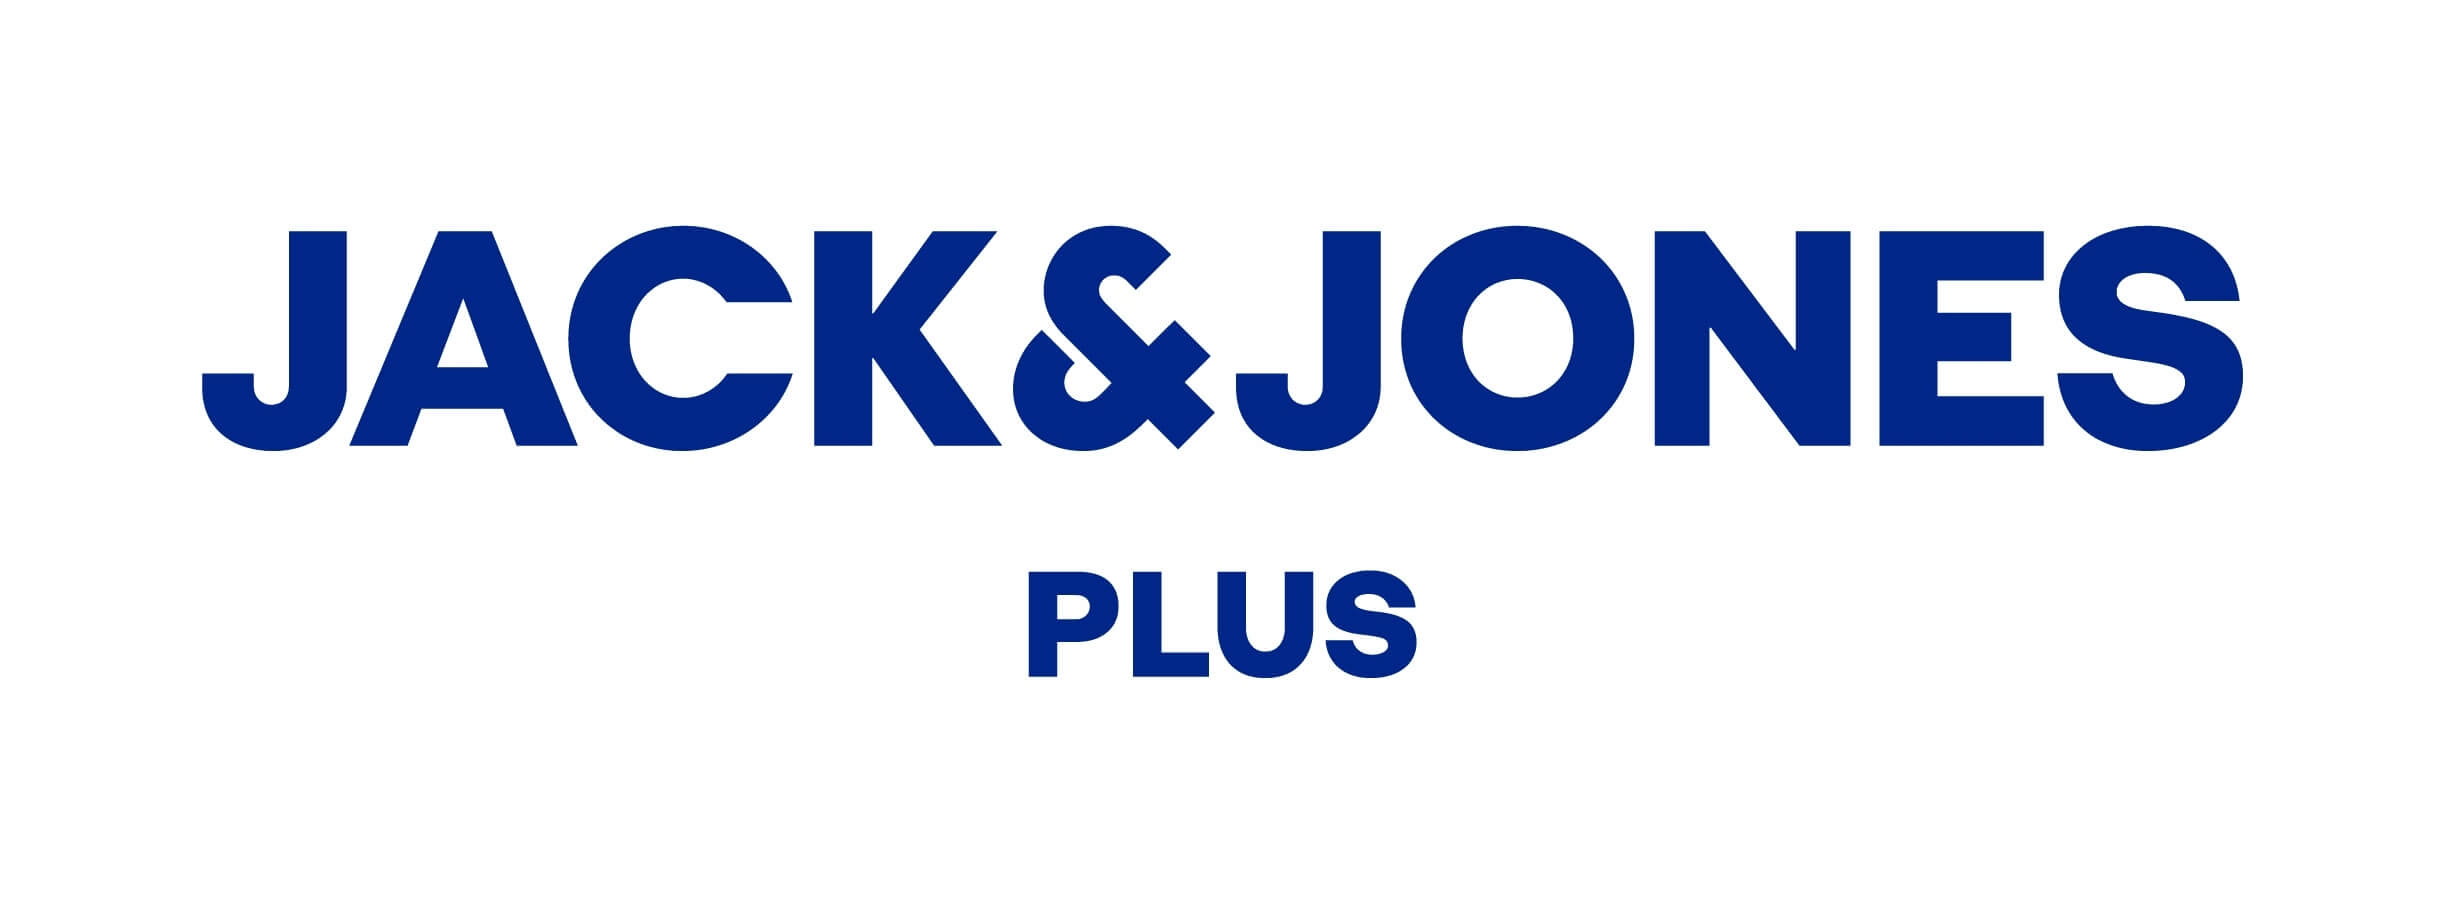 Jack&Jones PLUS